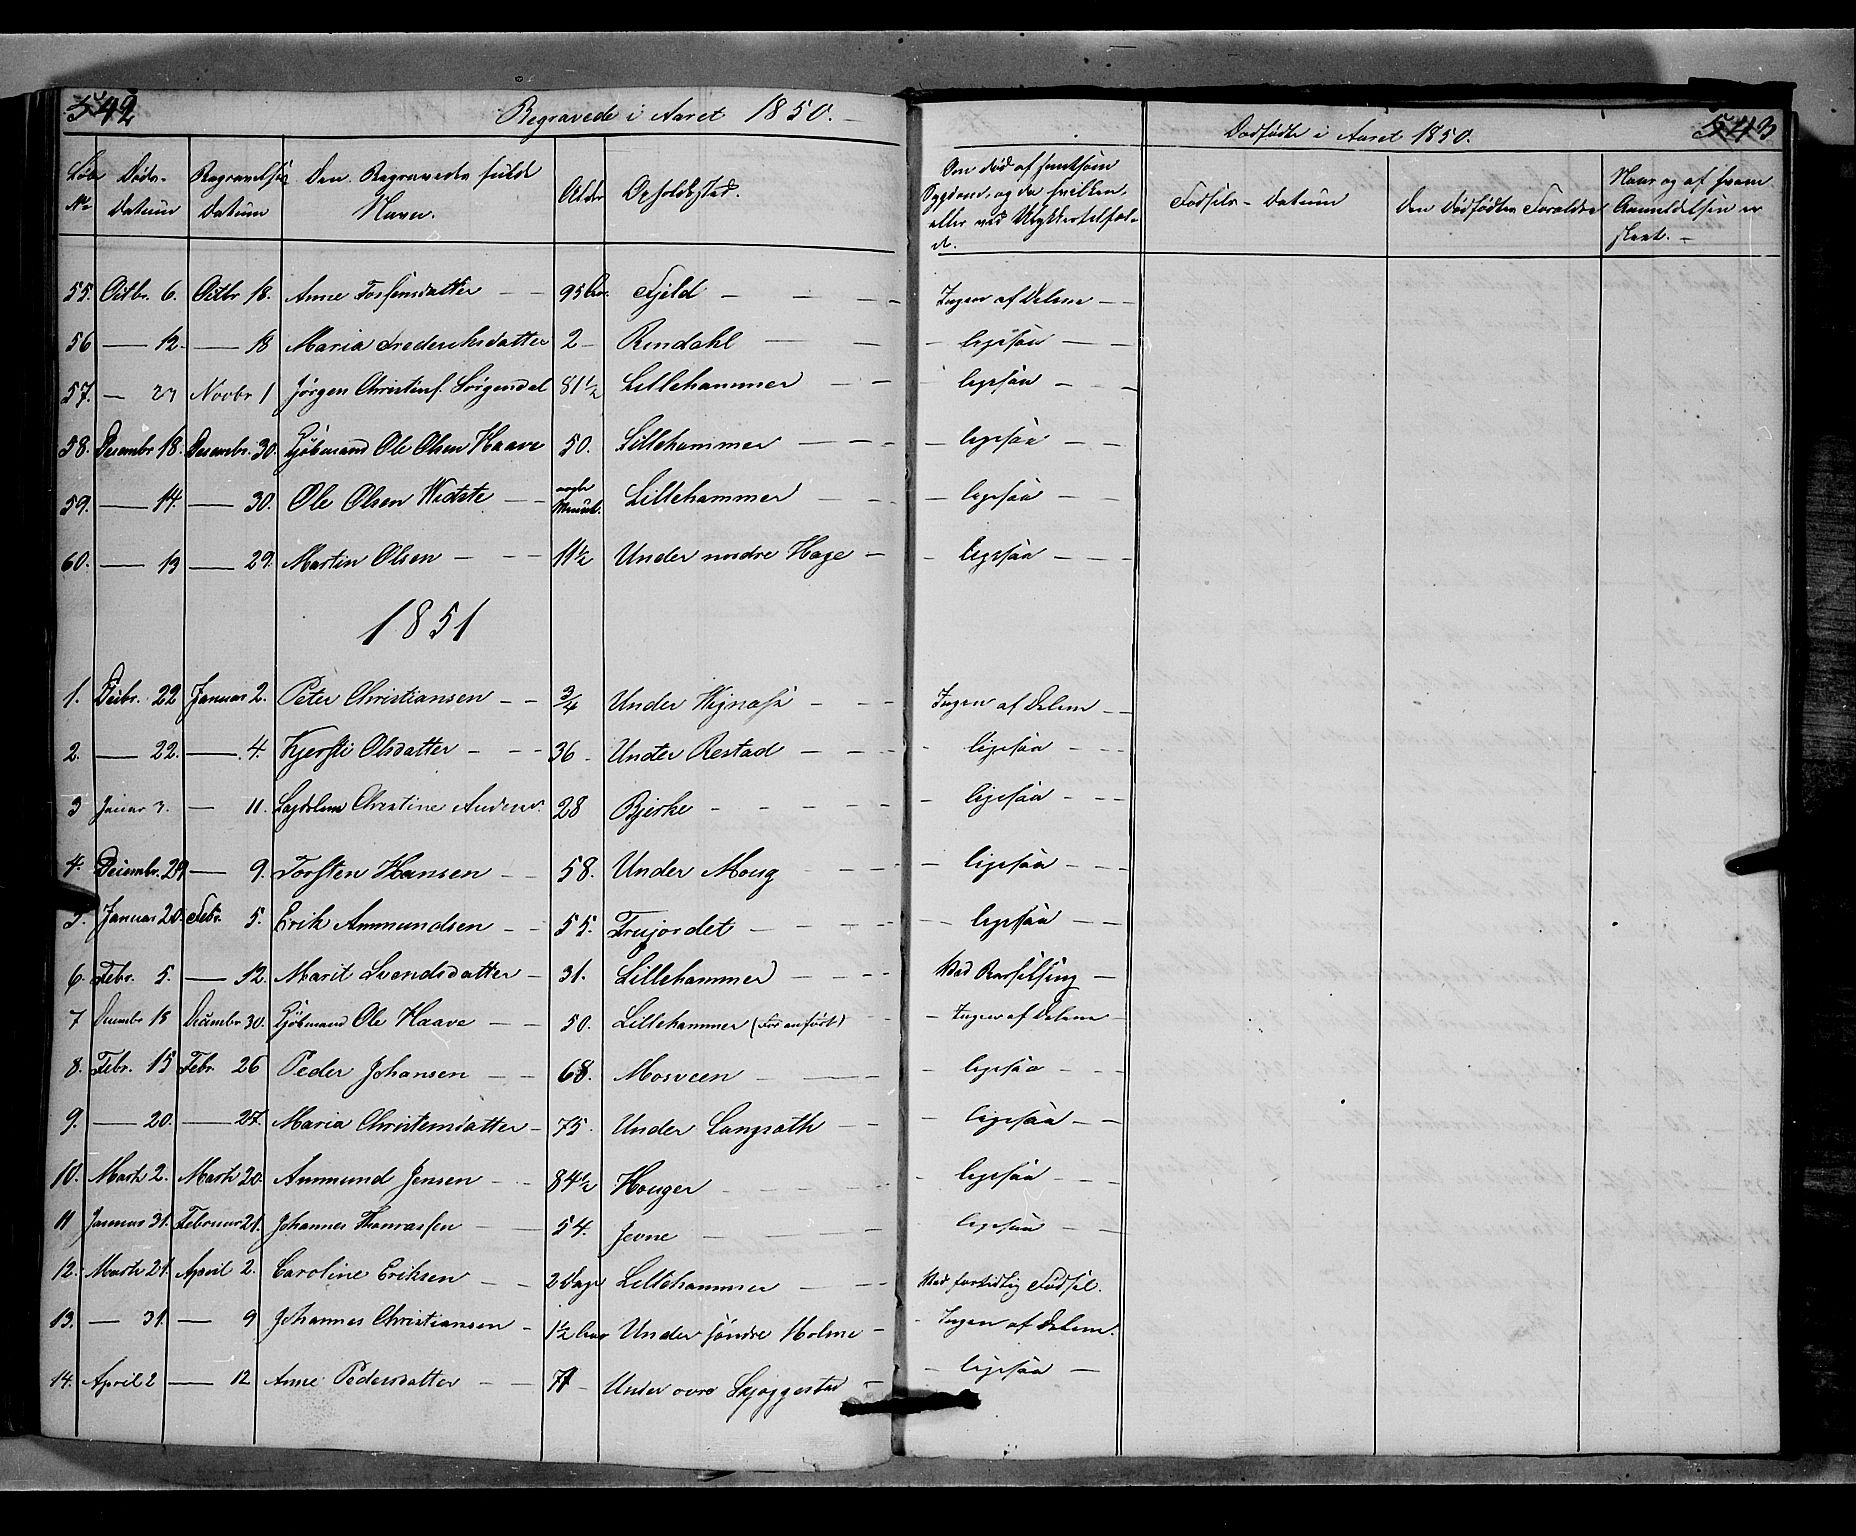 SAH, Fåberg prestekontor, Klokkerbok nr. 6, 1837-1855, s. 542-543